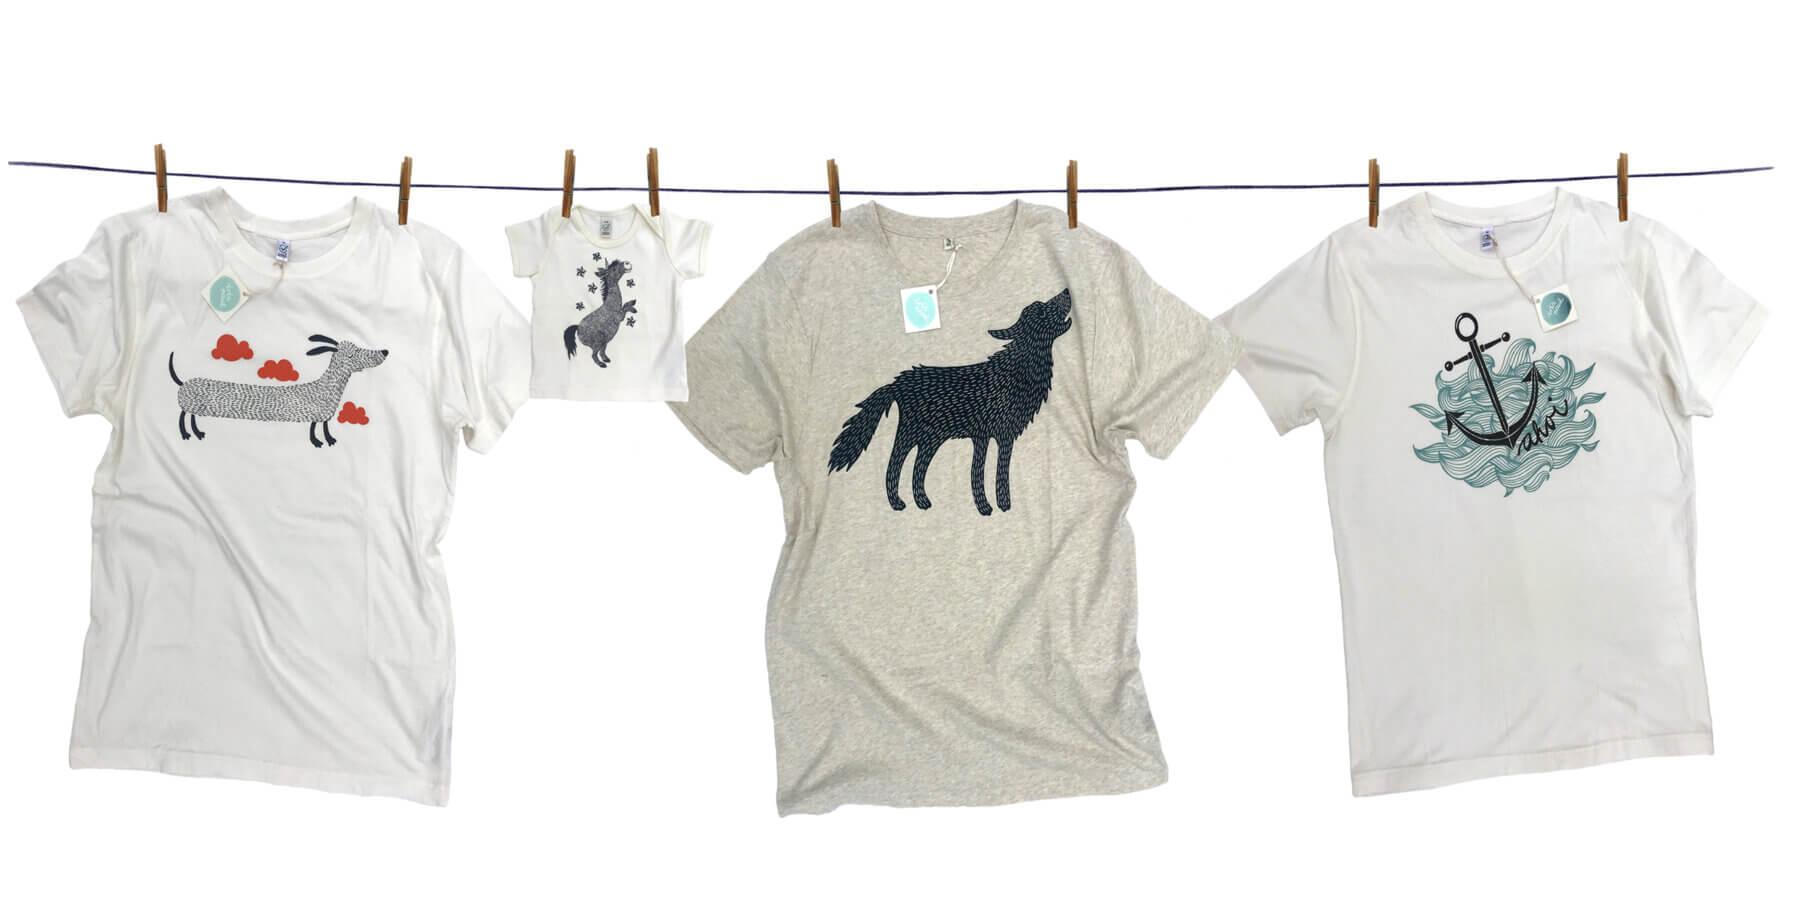 Schöne Dinge: T-Shirts Männer